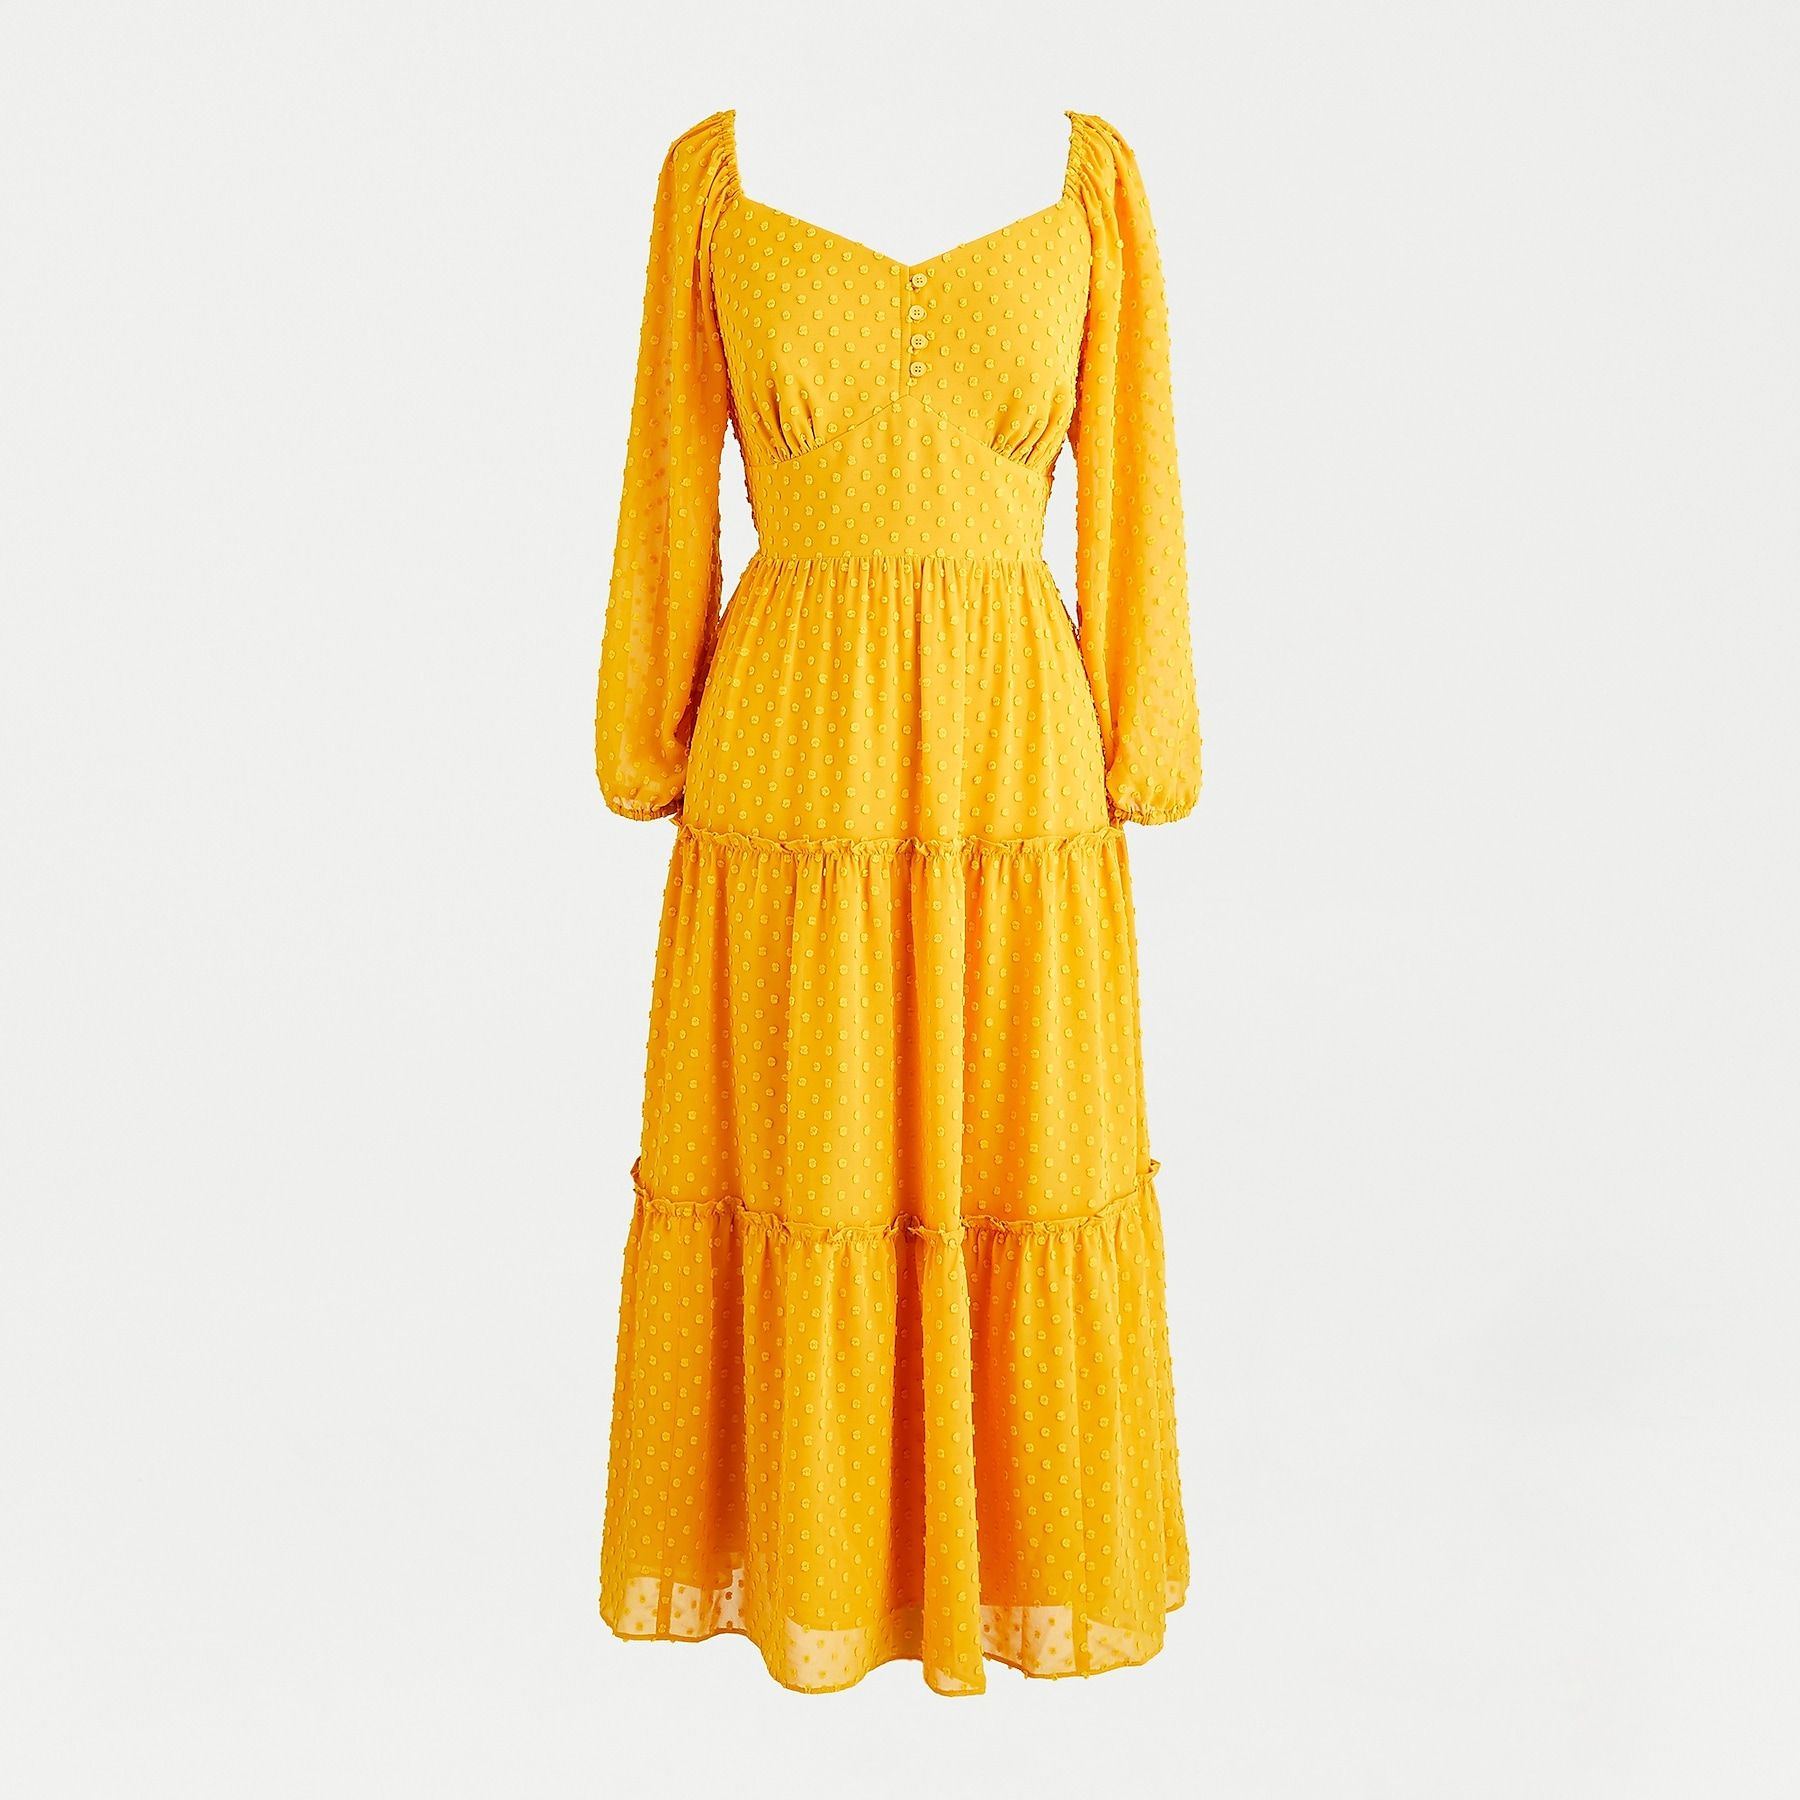 Tiered Long Sleeve Midi Dress In Swiss Dot Long Sleeve Midi Dress Long Sleeve Print Dress Womens Dresses [ 1800 x 1800 Pixel ]